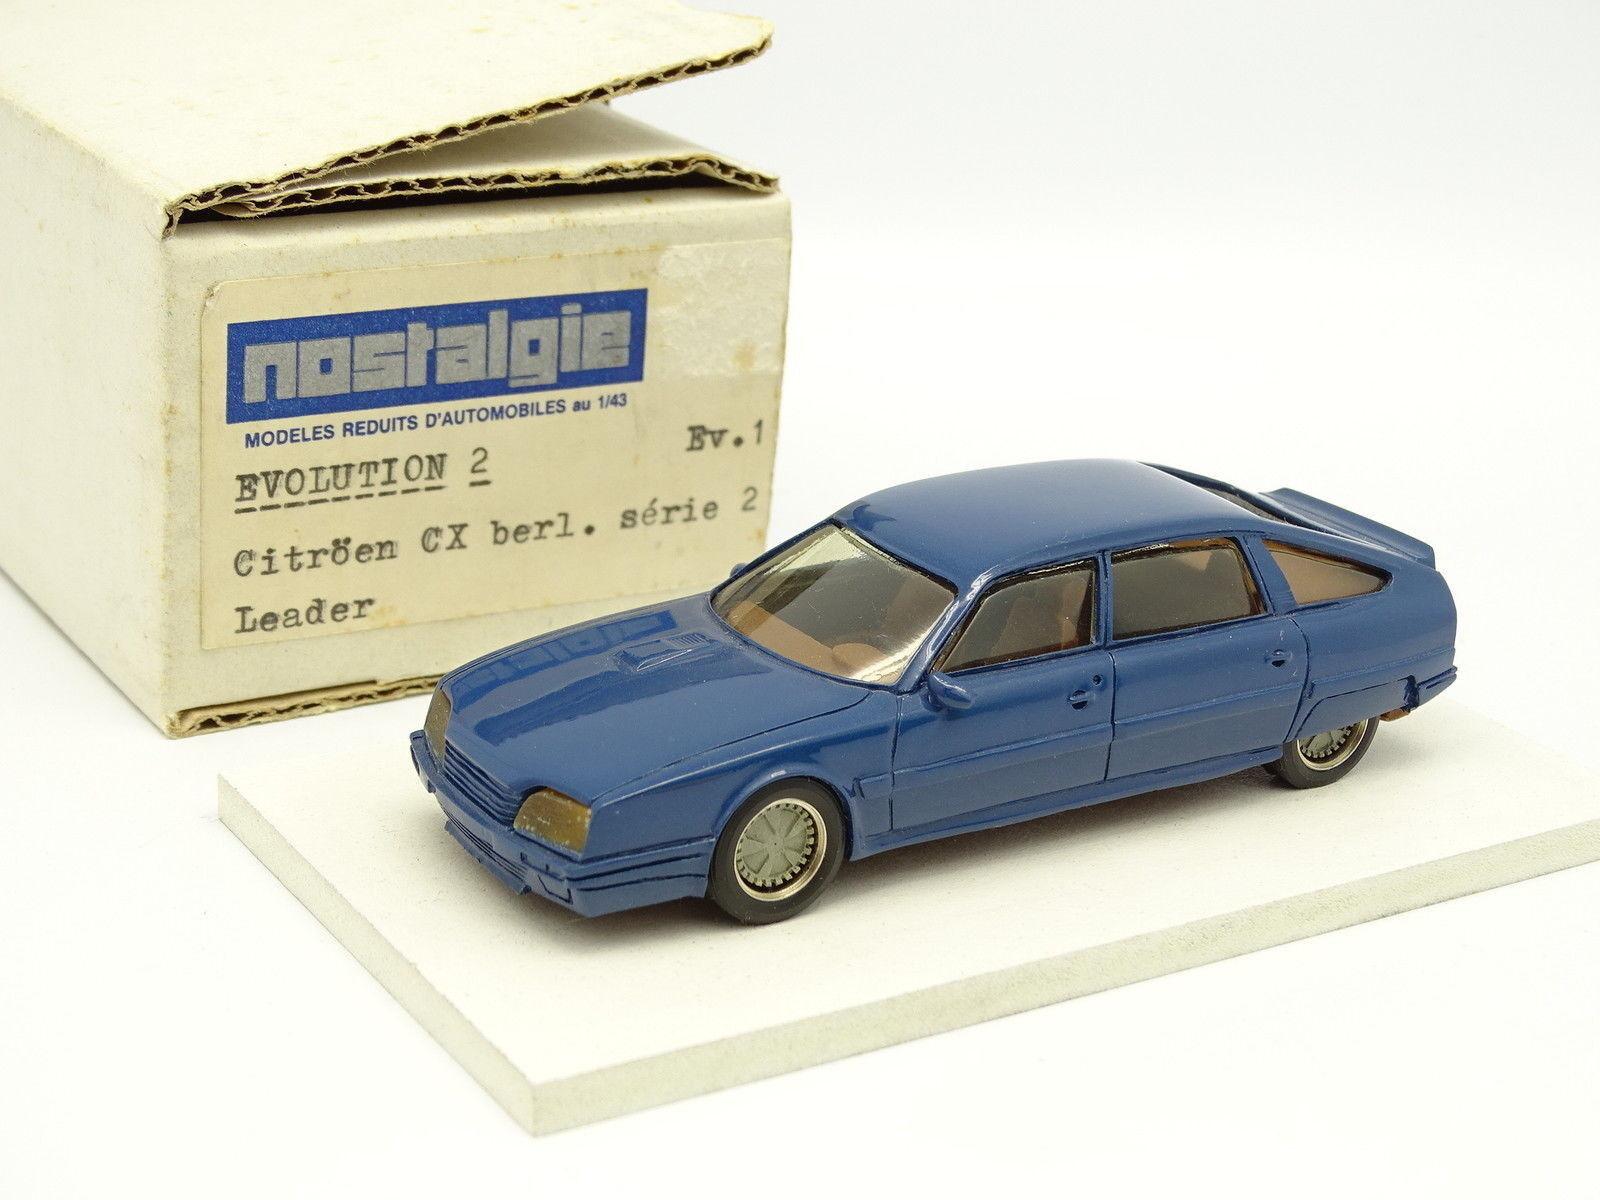 Nostalgie Heco Modellle Harz 1 43 - Citroen Cx Serie 2 Blau